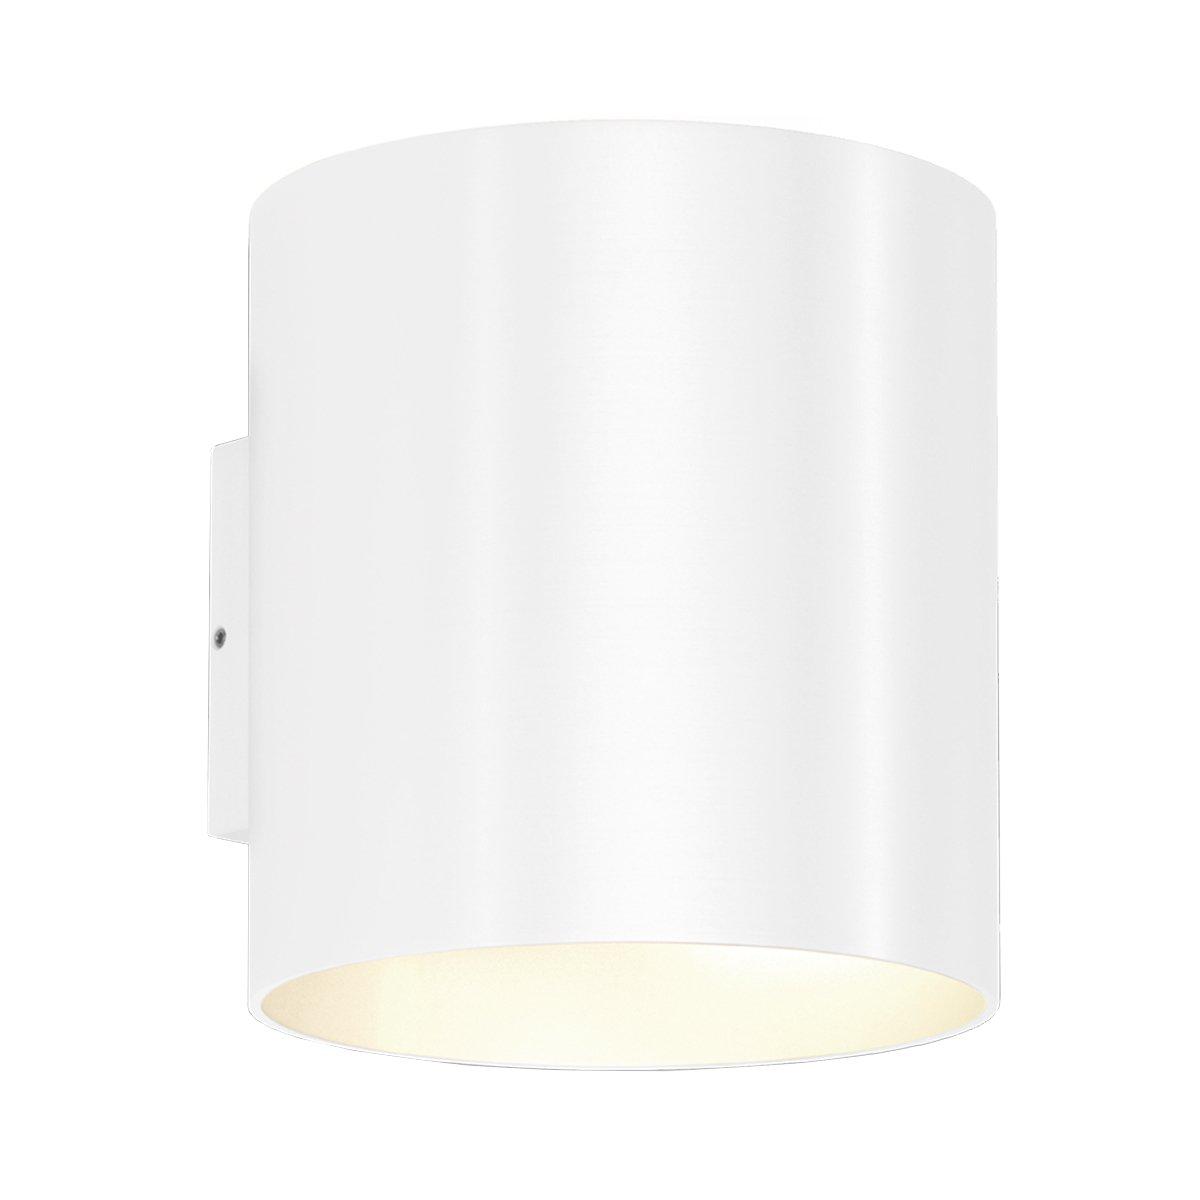 Wever & Ducr� Ray 3.0 Outdoor Wandlamp Wit - 2700 Kelvin